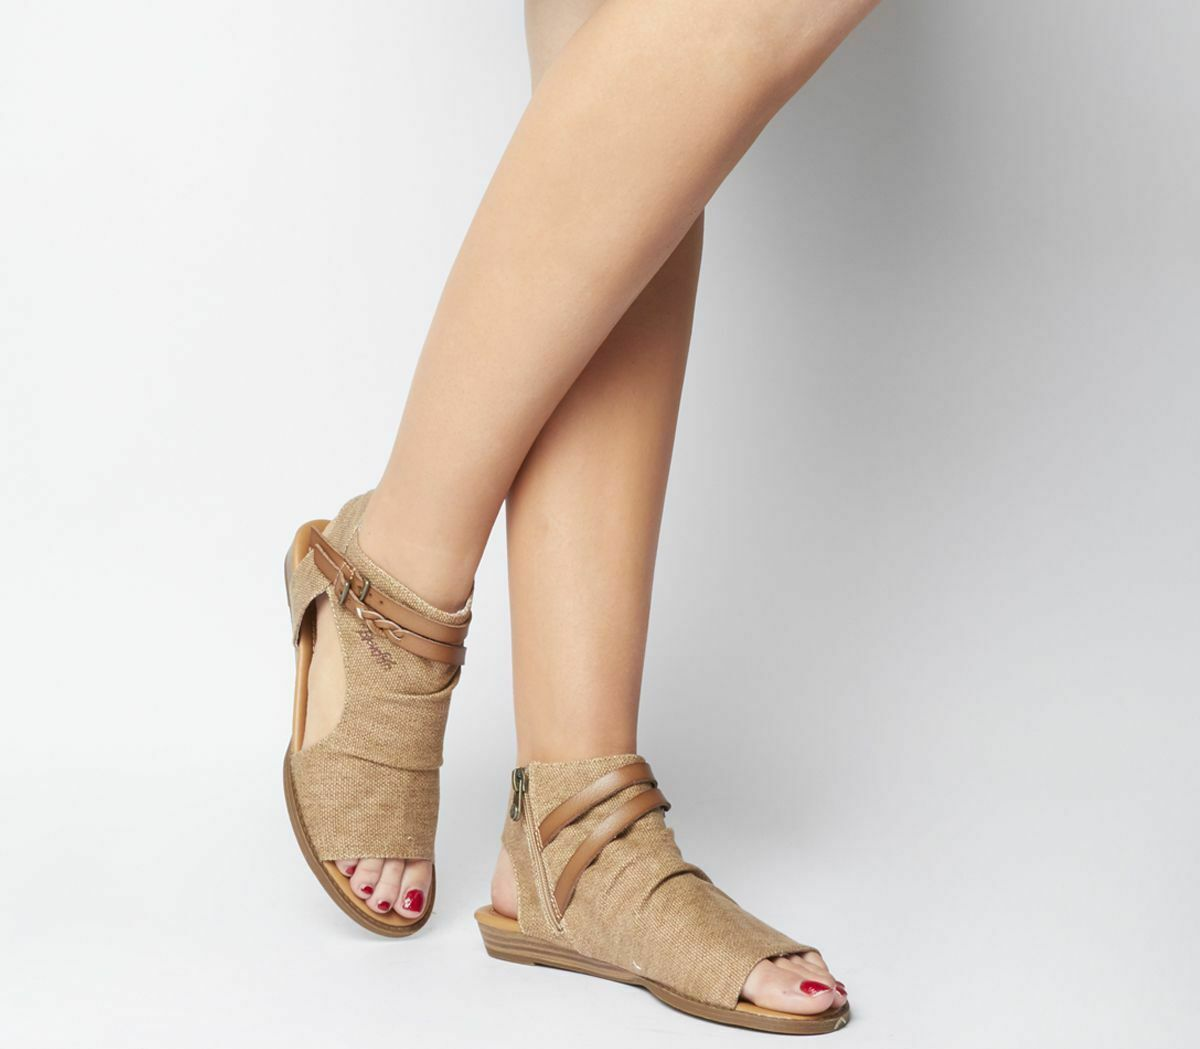 damen Blowfish Malibu Blaumoon Sandals Sahara Wheat Sandals